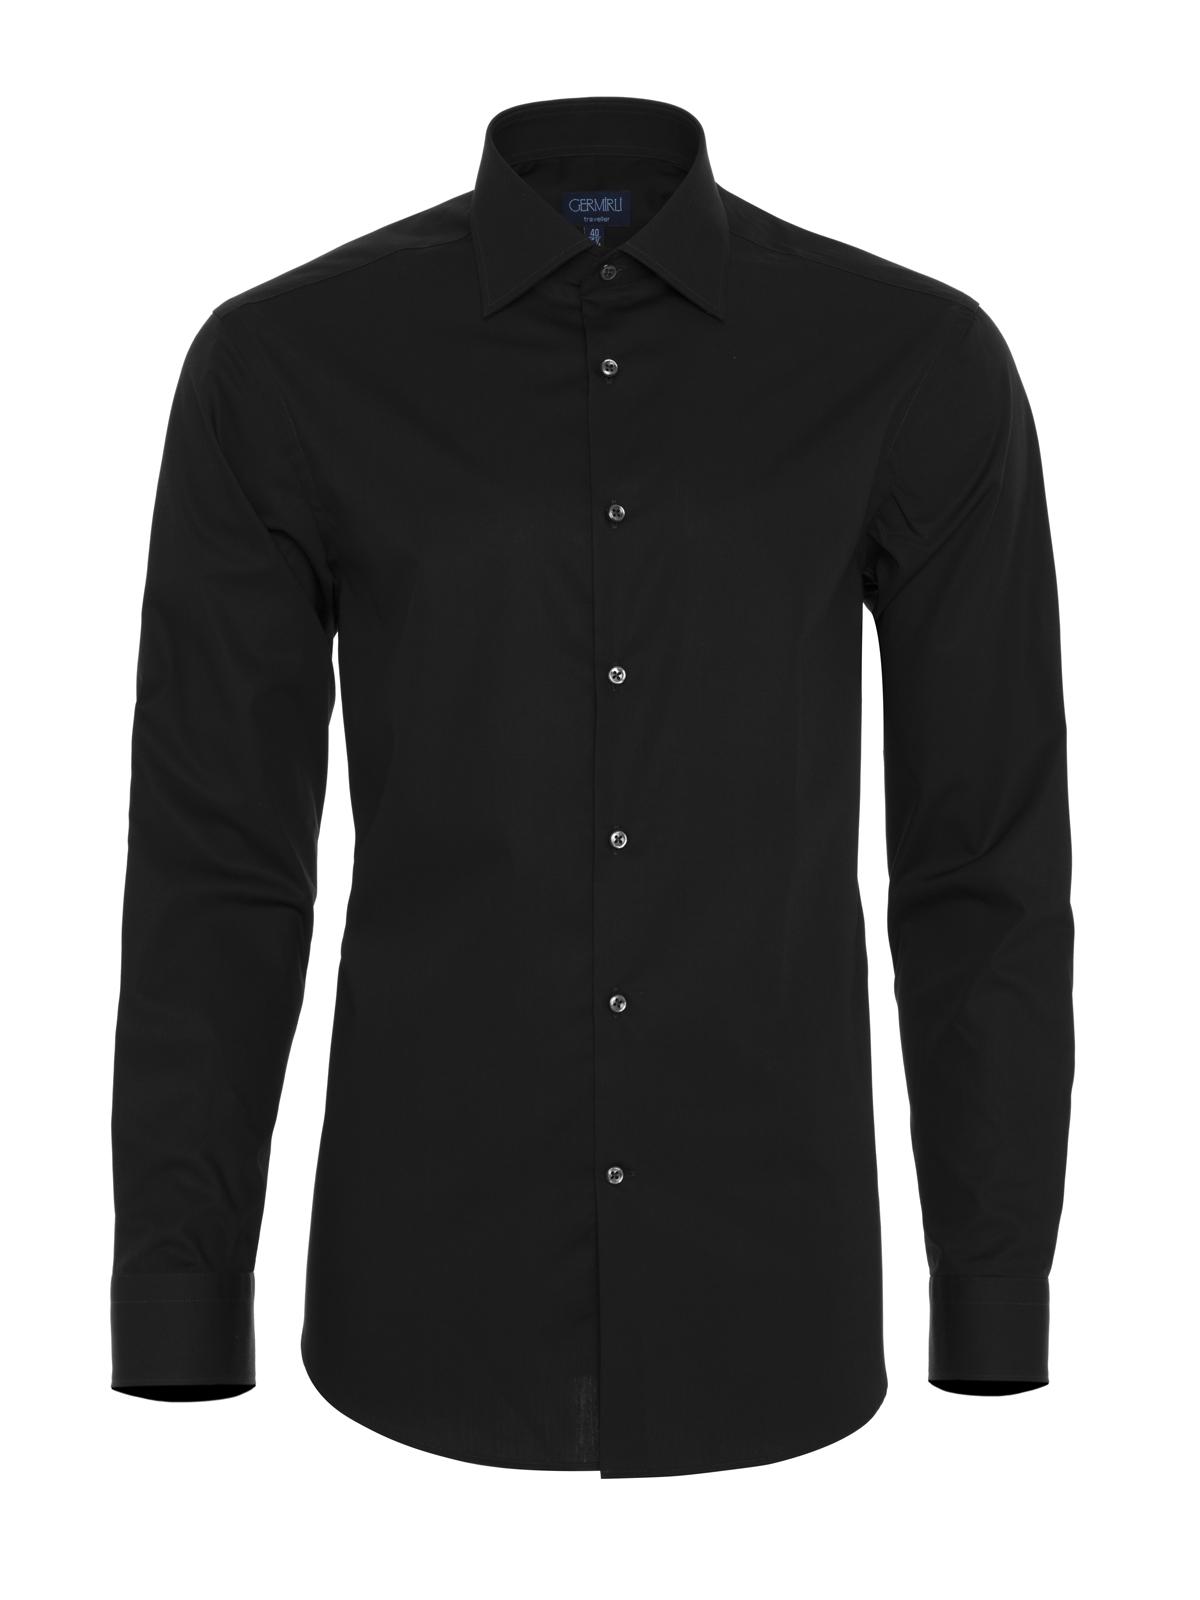 Germirli Non Iron Navy Blue Poplin Semi Spread Tailor Fit Shirt